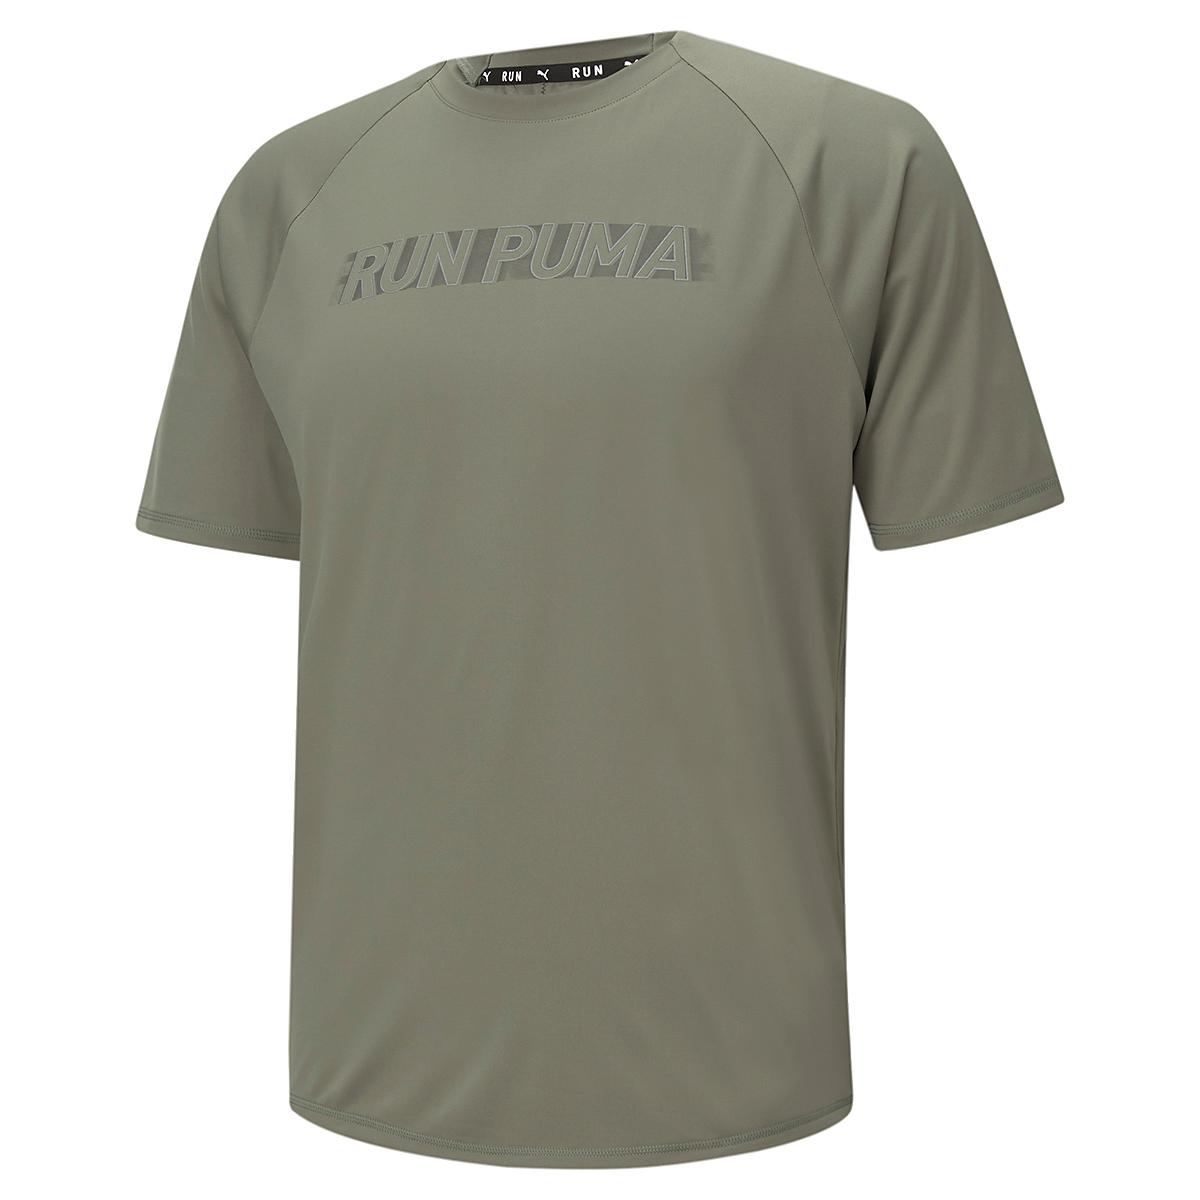 Men's Puma Run Lite COOLadapt Short Sleeve Tee - Color: Vetiver - Size: XXS, Vetiver, large, image 2